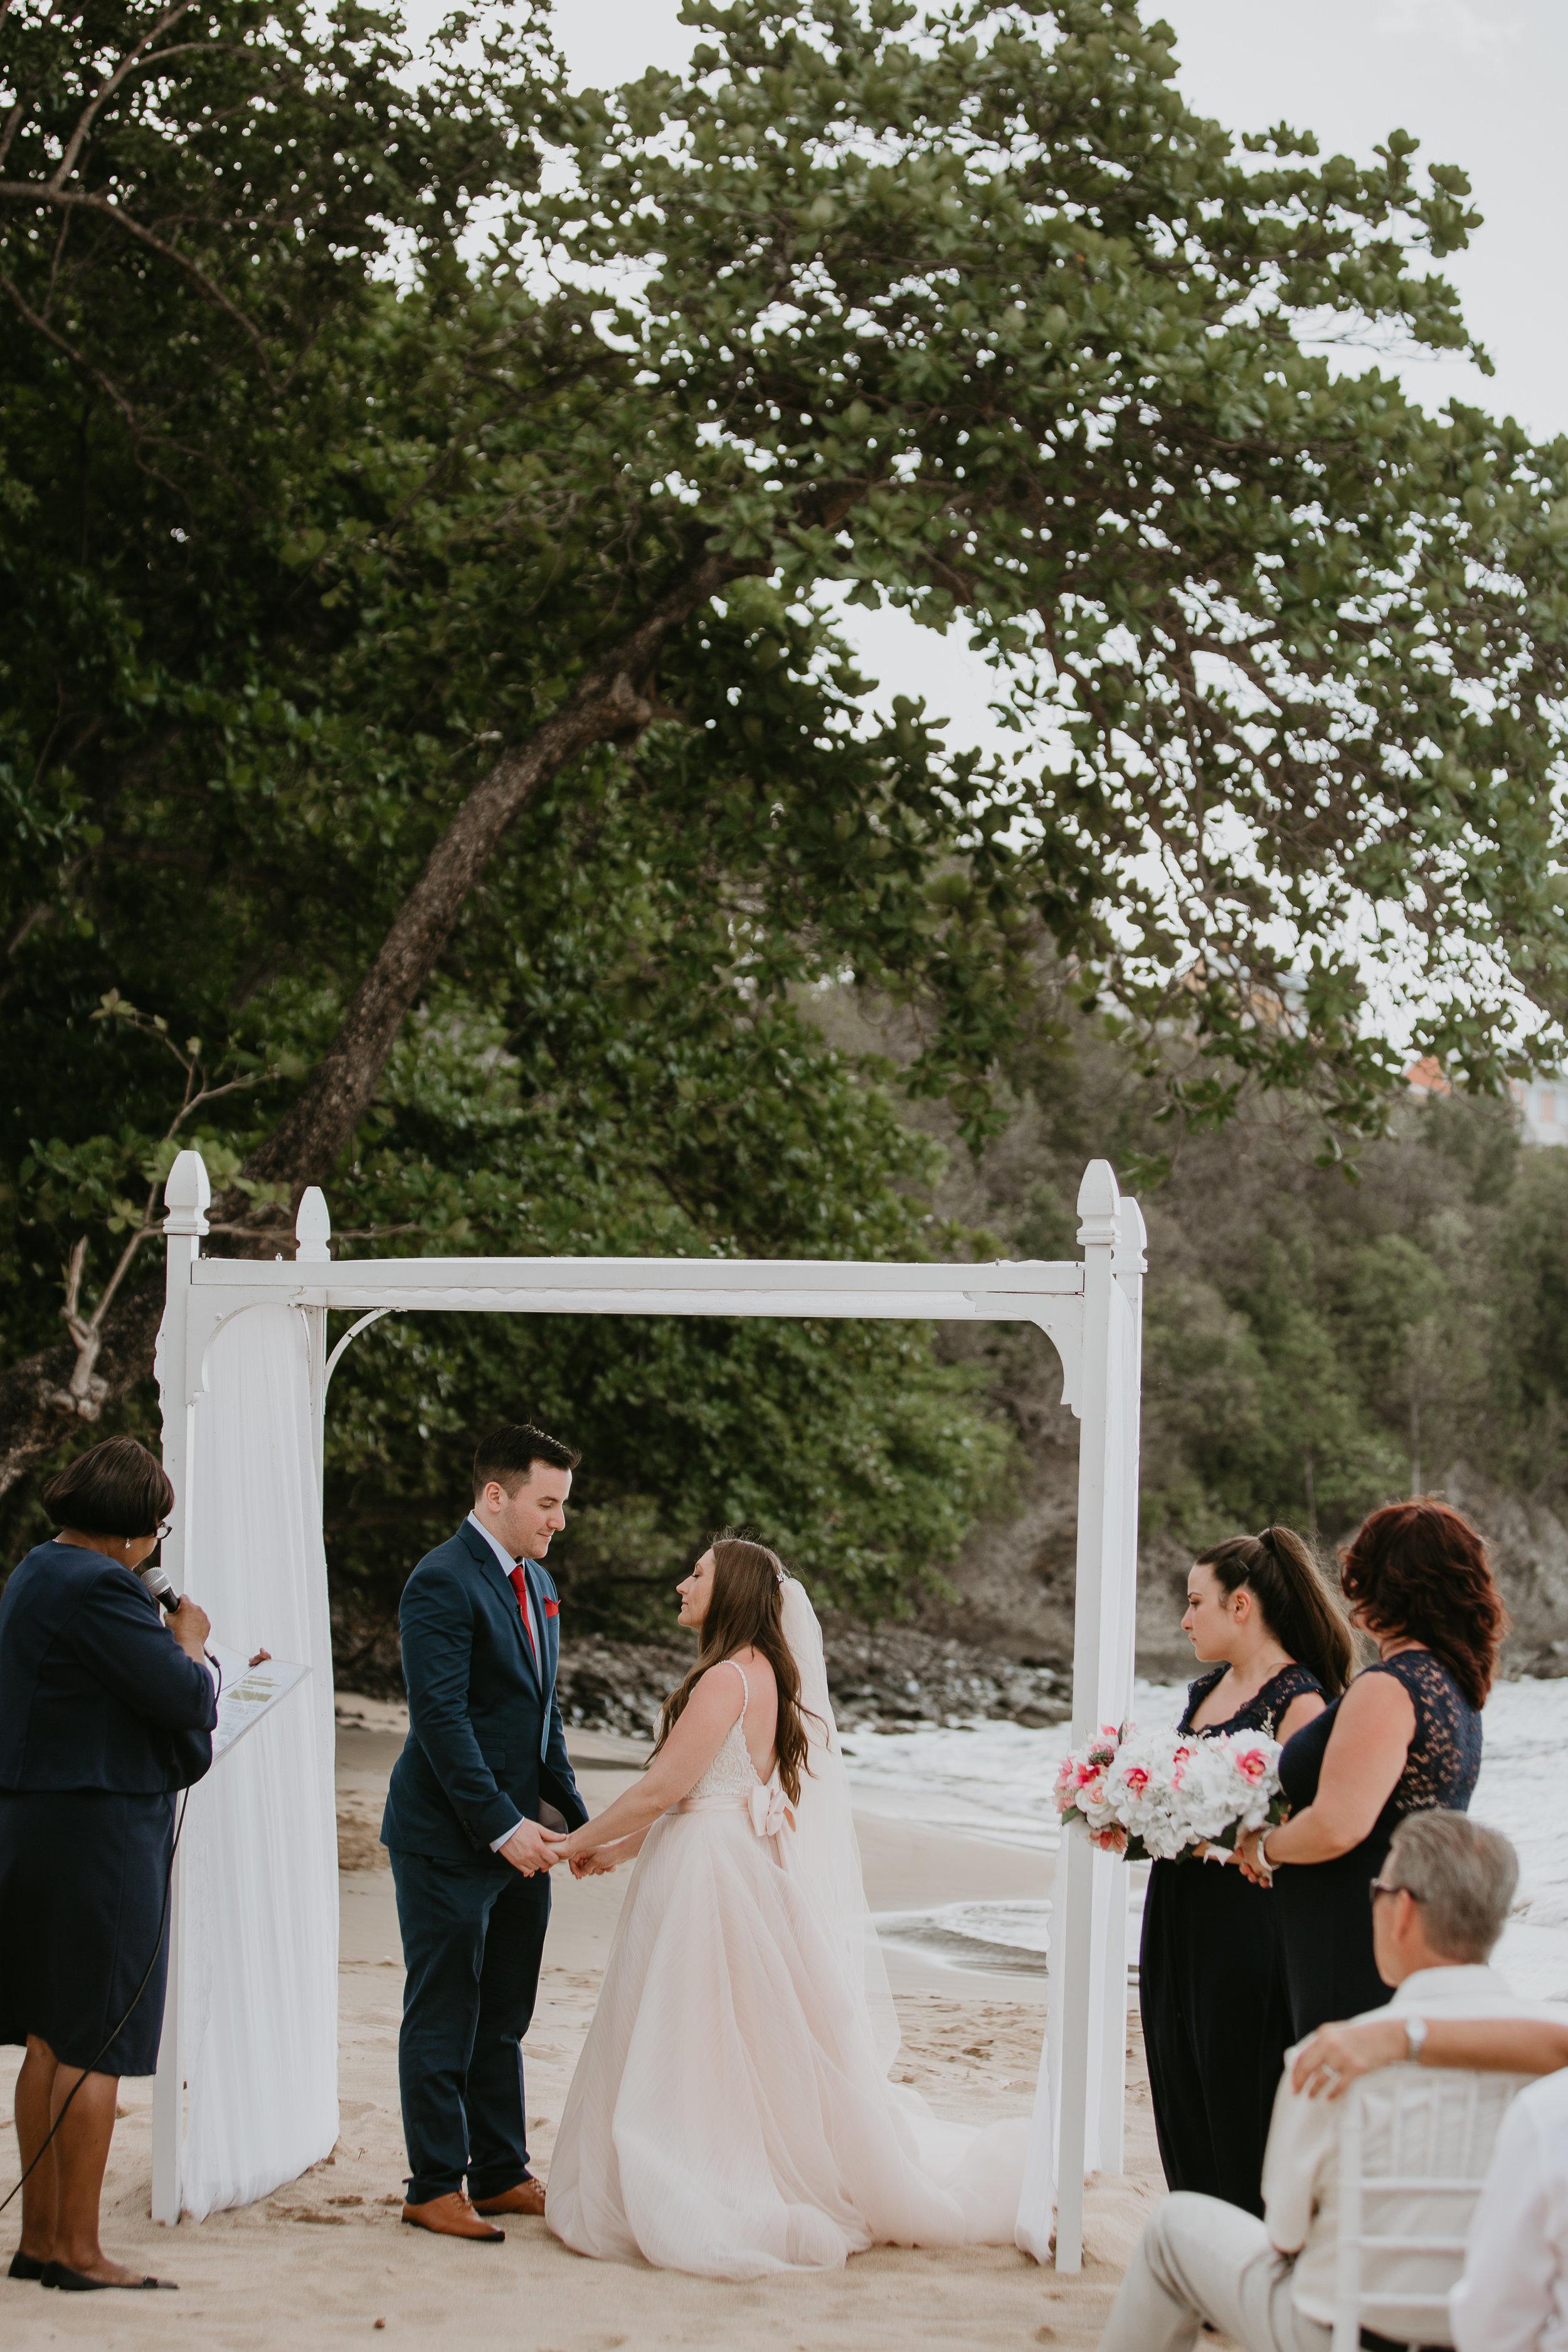 nicole-daacke-photography-destination-wedding-in-st-lucia-sandals-la-toc-intimate-island-wedding-carribean-elopement-photographer-chill-island-wedding-62.jpg